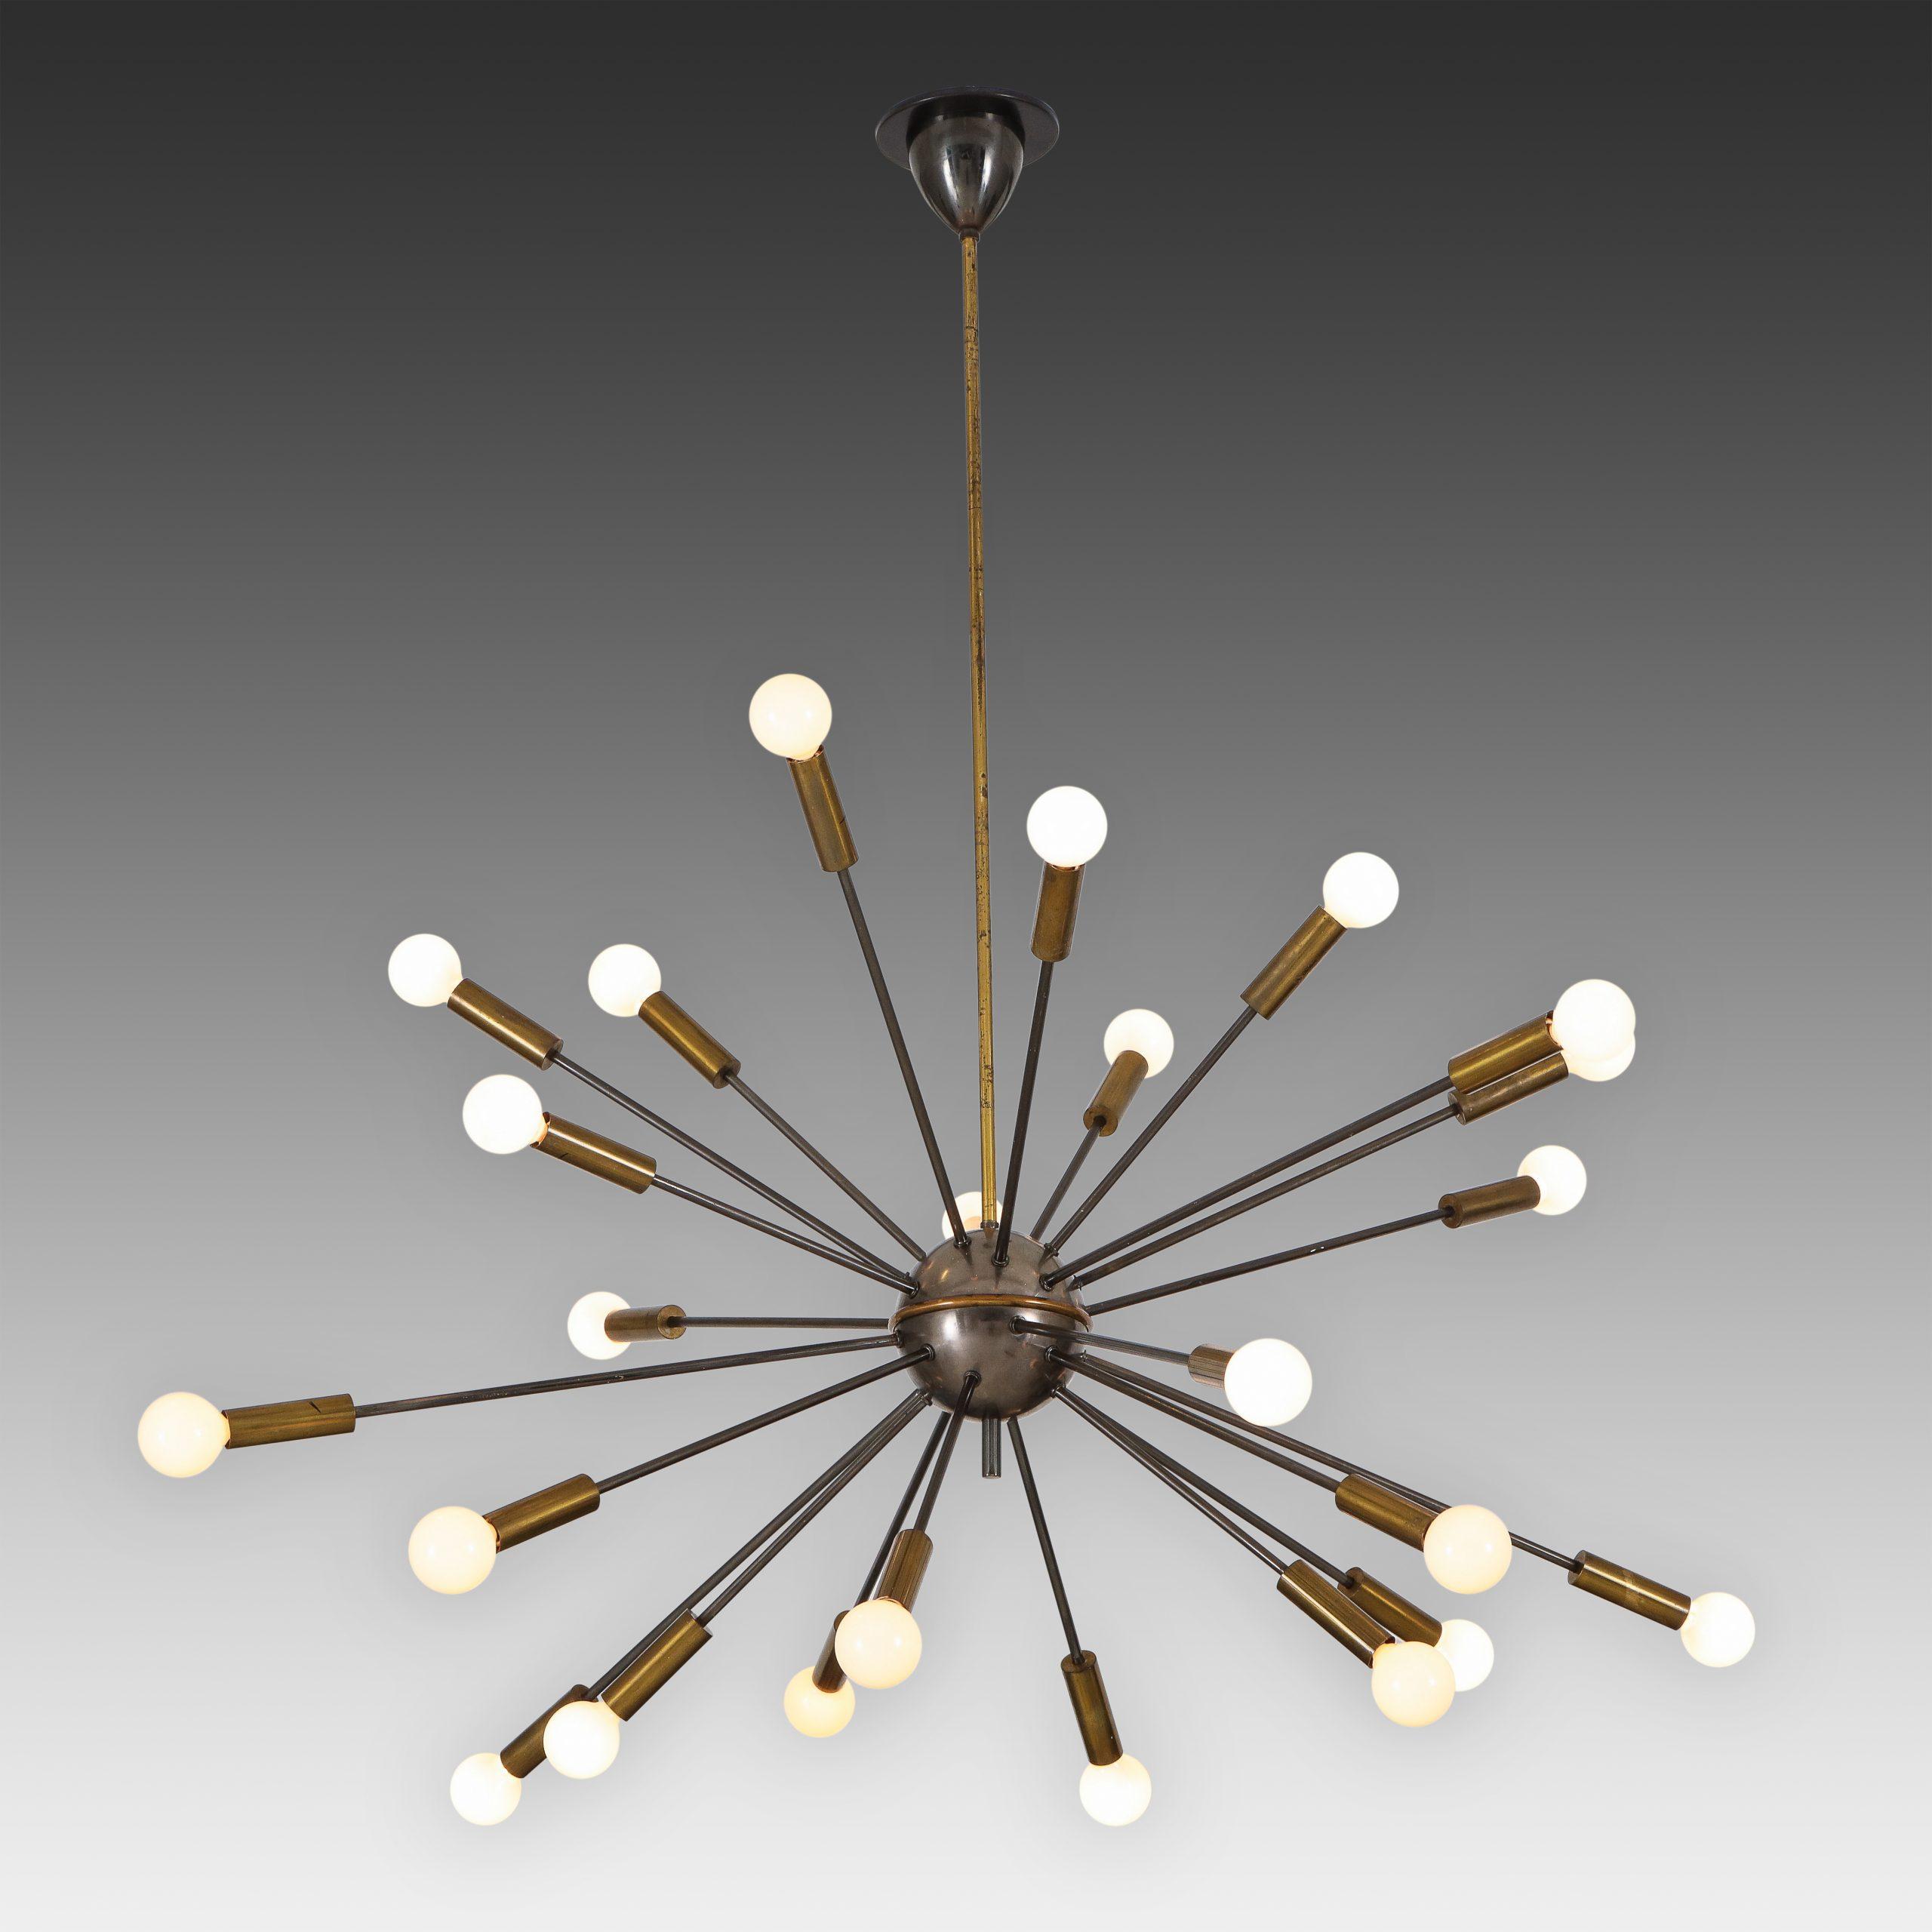 Sputnik Chandelier by Stilnovo   soyun k.